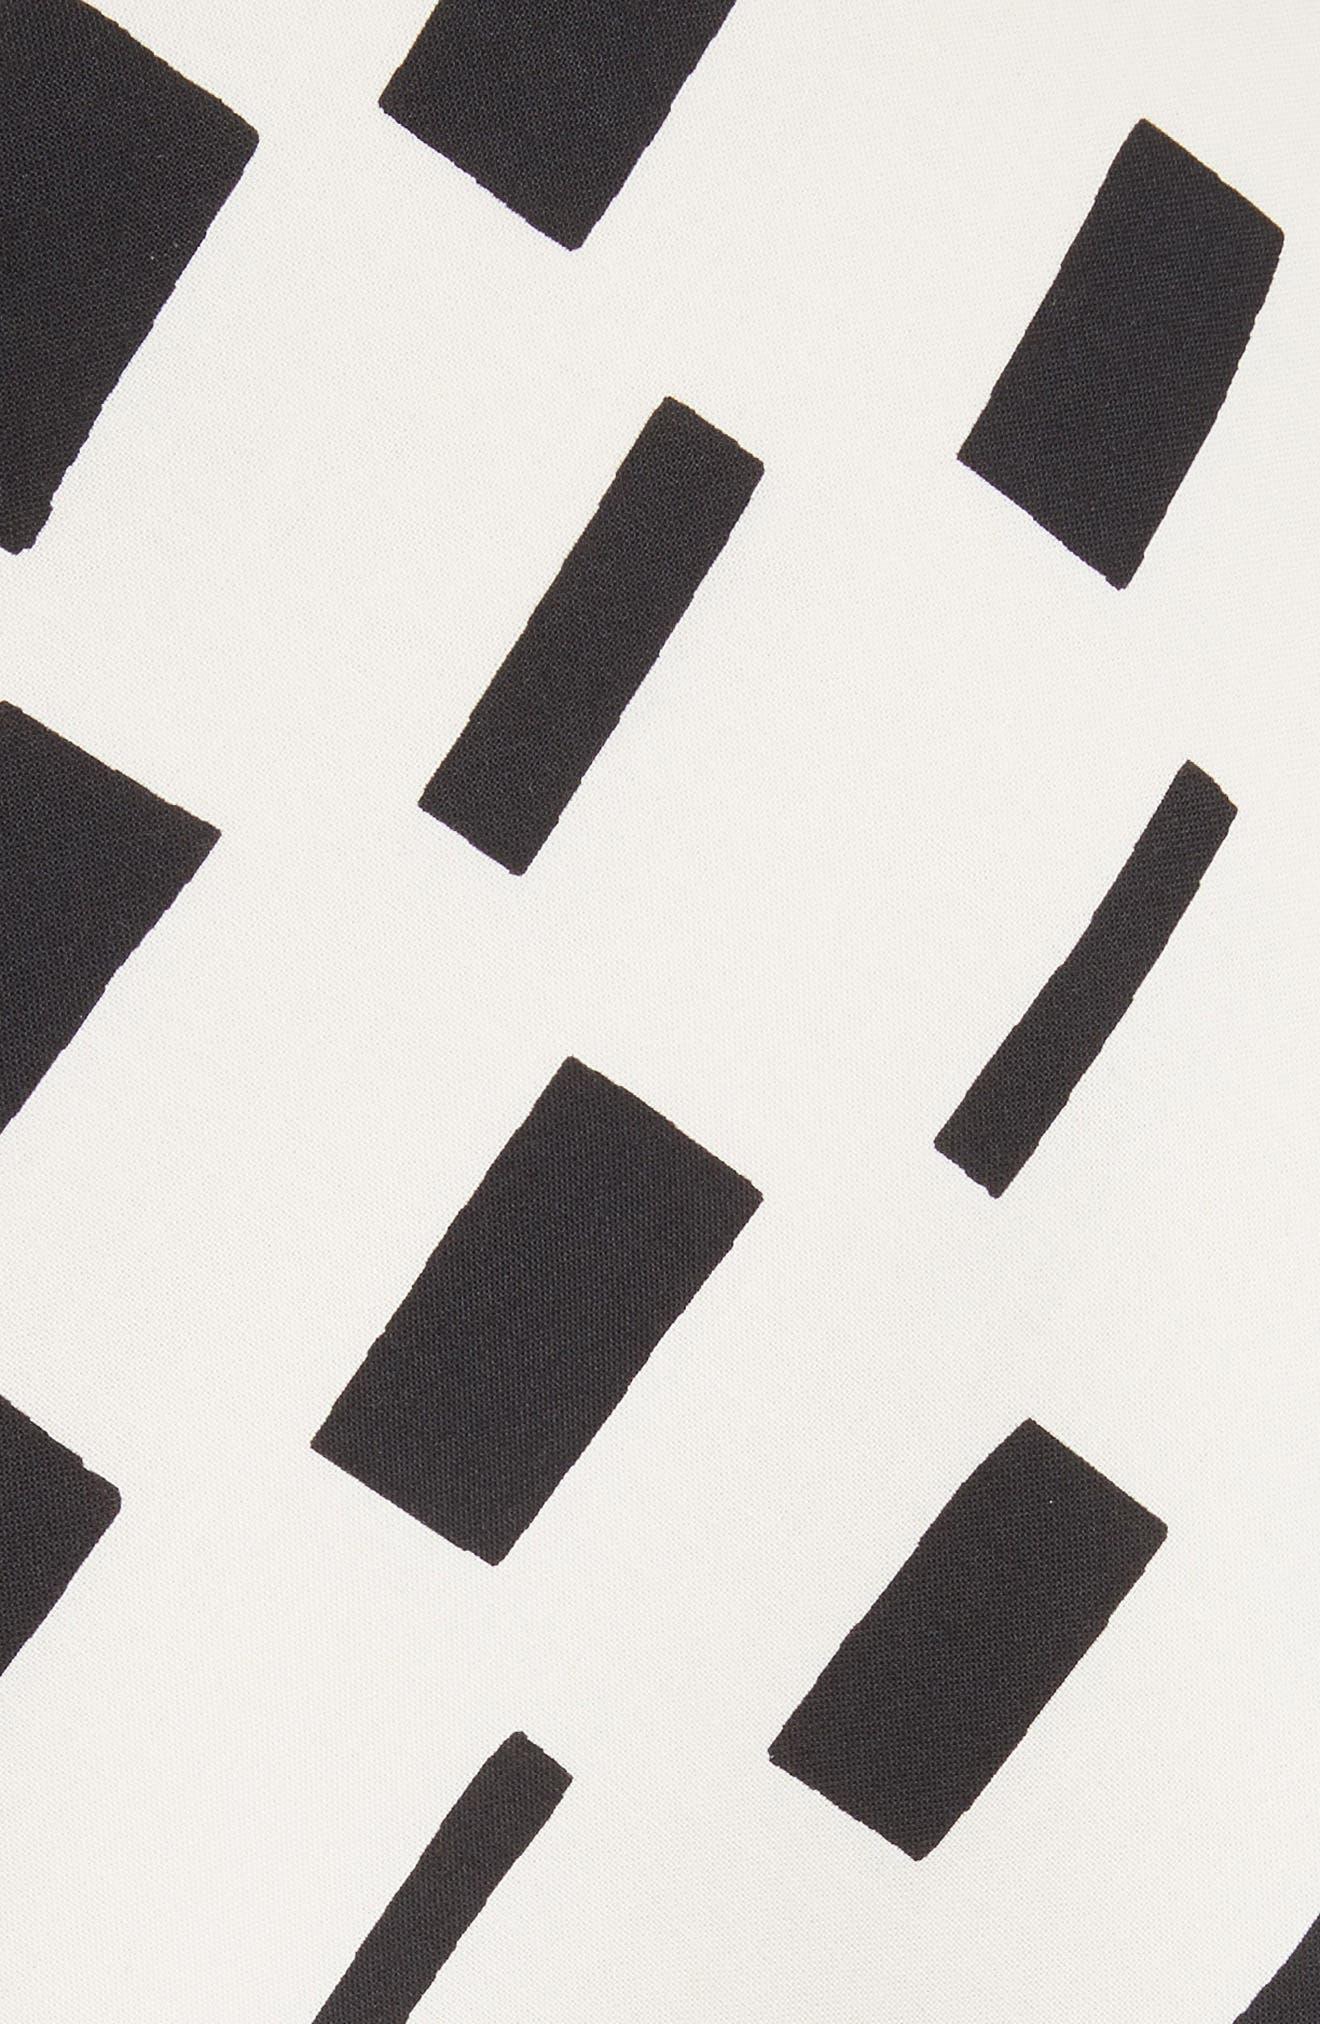 Interweave Geo Print Dress,                             Alternate thumbnail 6, color,                             Off White/ Black